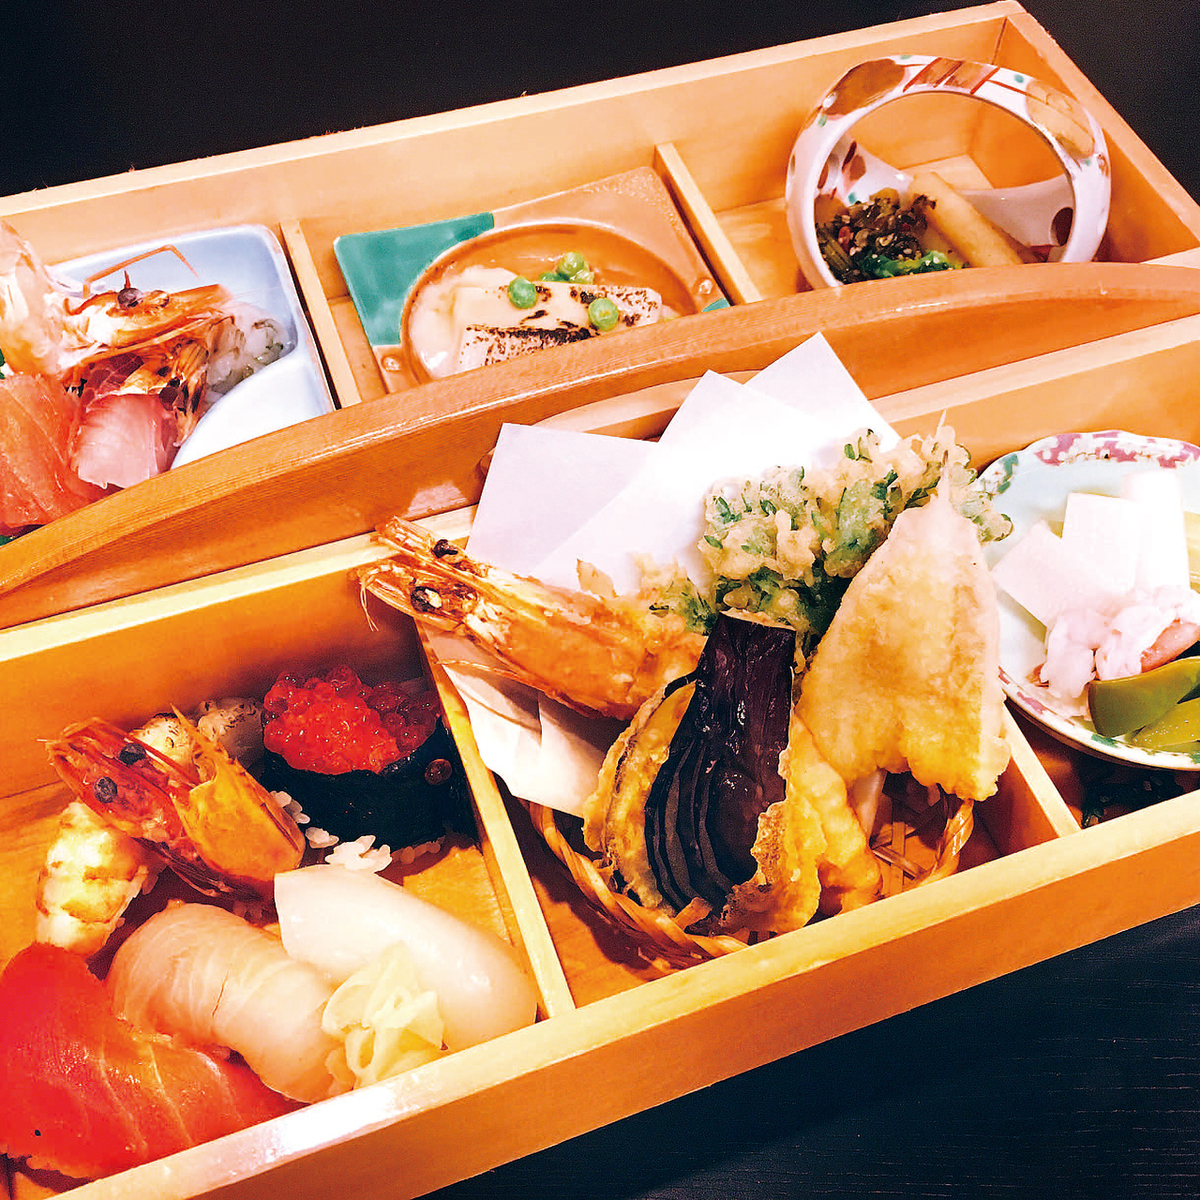 Aya's box lunch